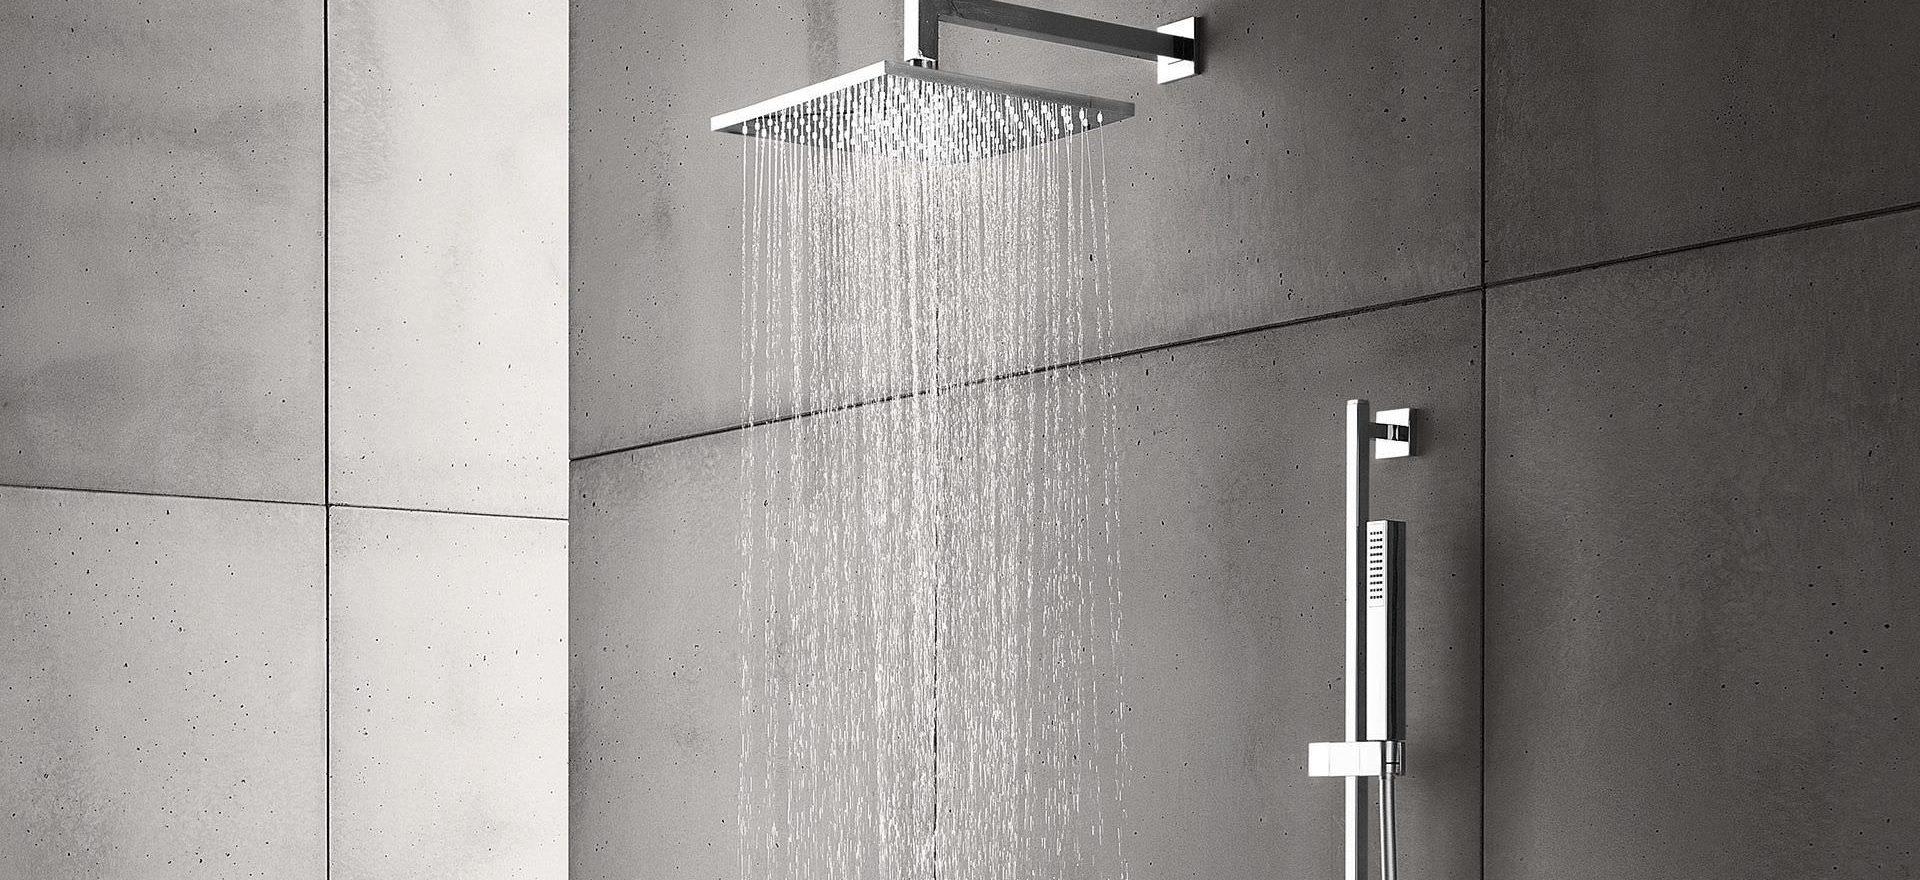 Ceiling Mounted Shower Head modern flush mount lighting corner bathroom sink cabinet